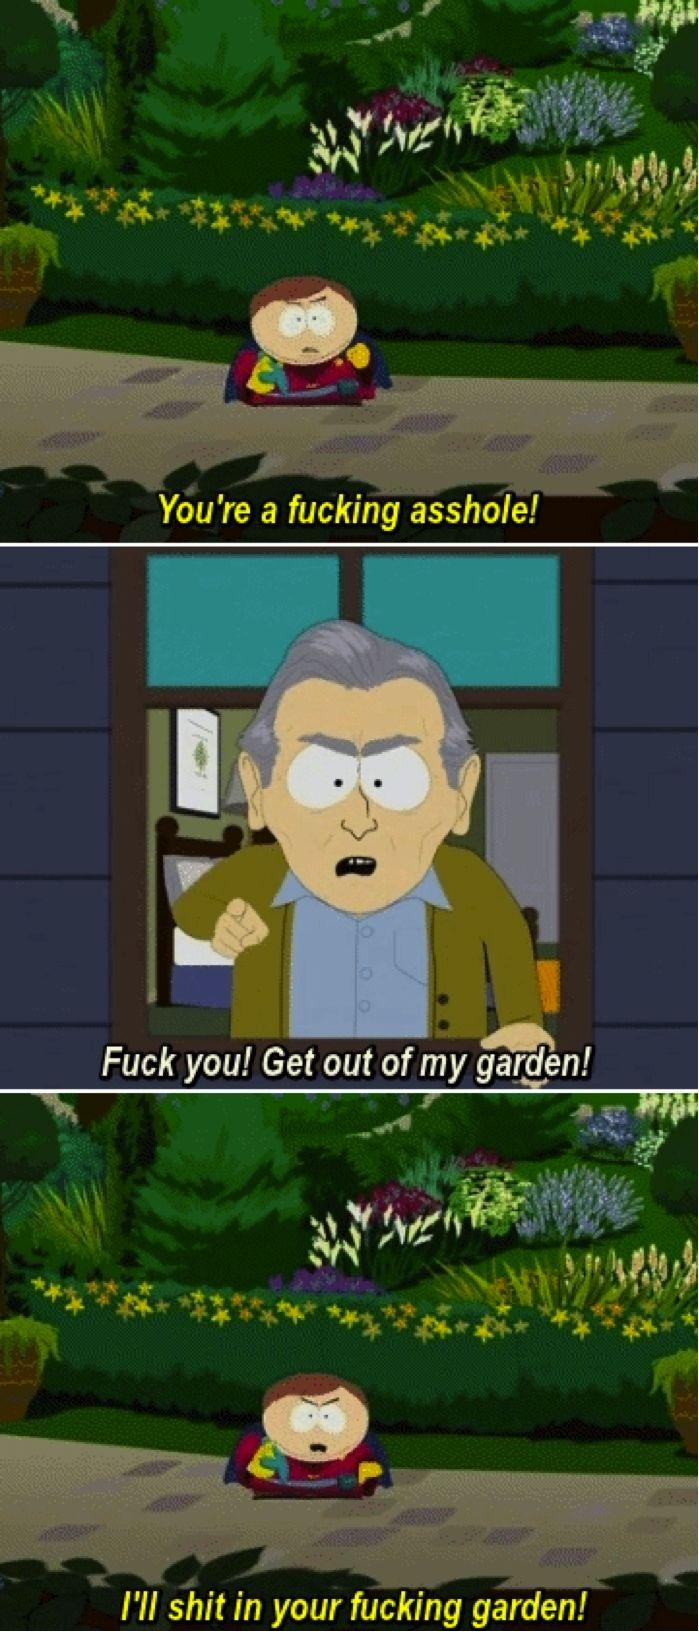 Cartman • I'll shit in your fucking garden!